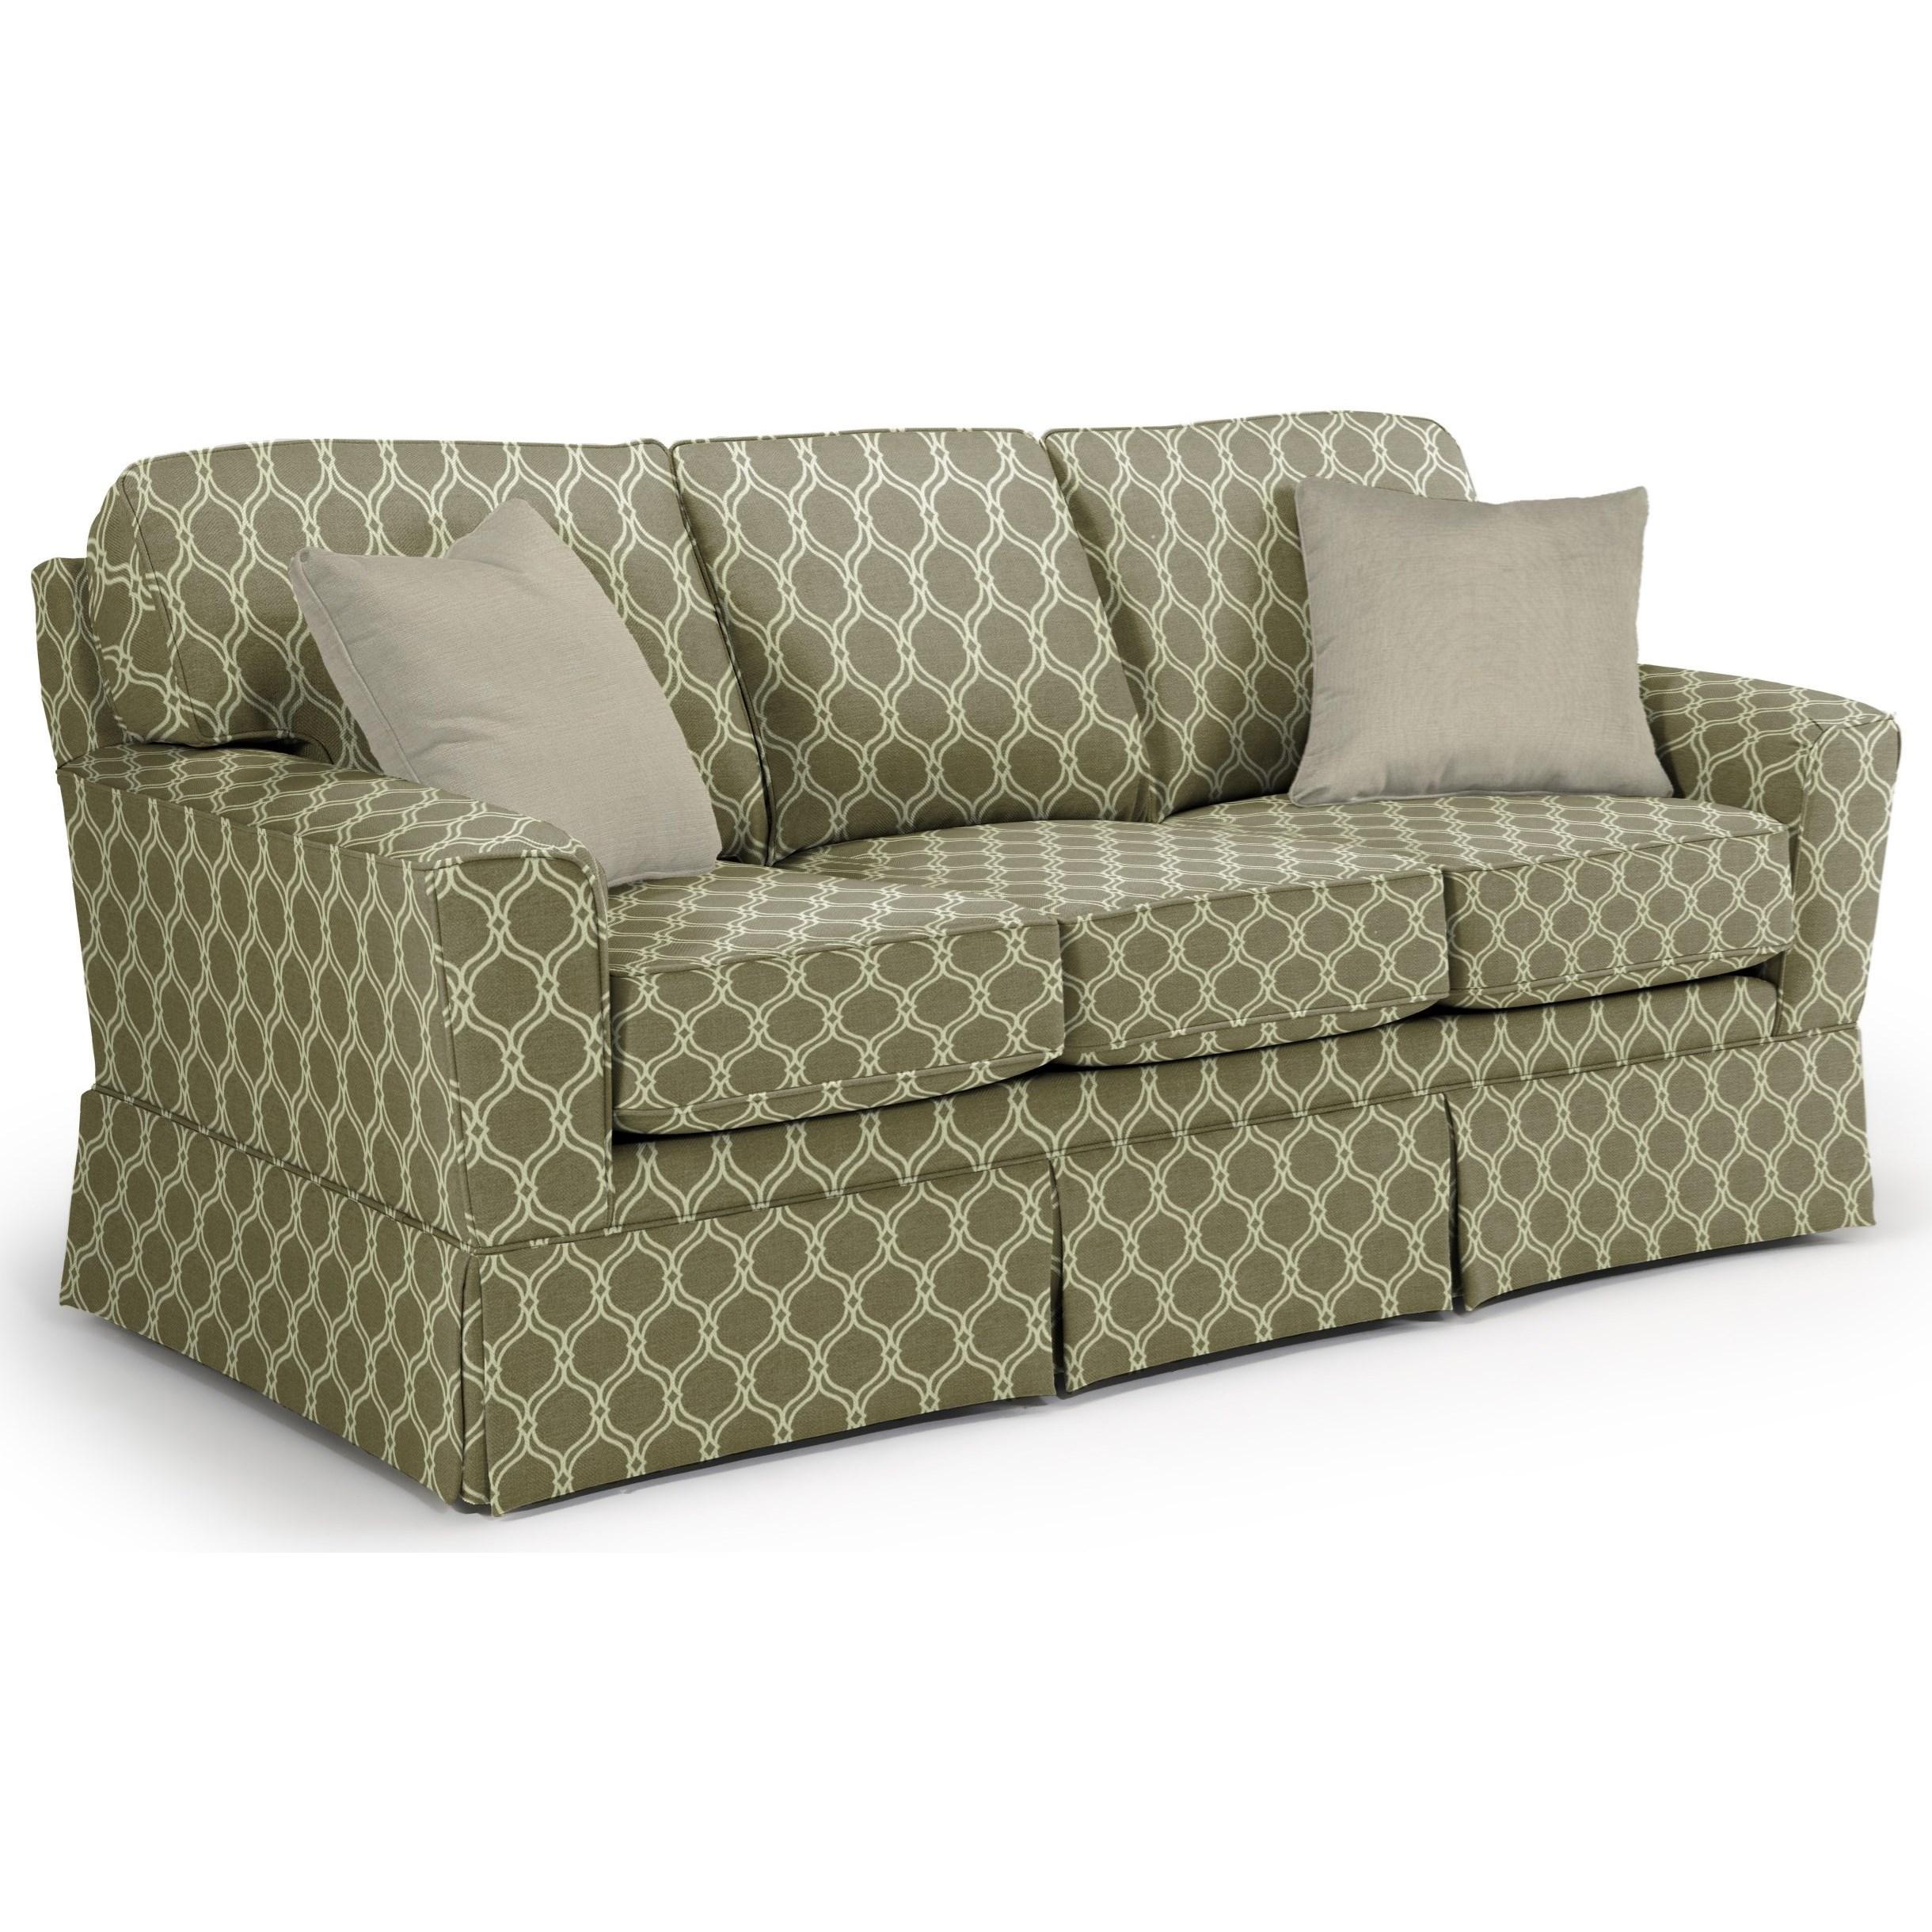 Best Home Furnishings Annabel  <b>Custom</b> 3 Over 3 Sofa - Item Number: -2110035674-28423